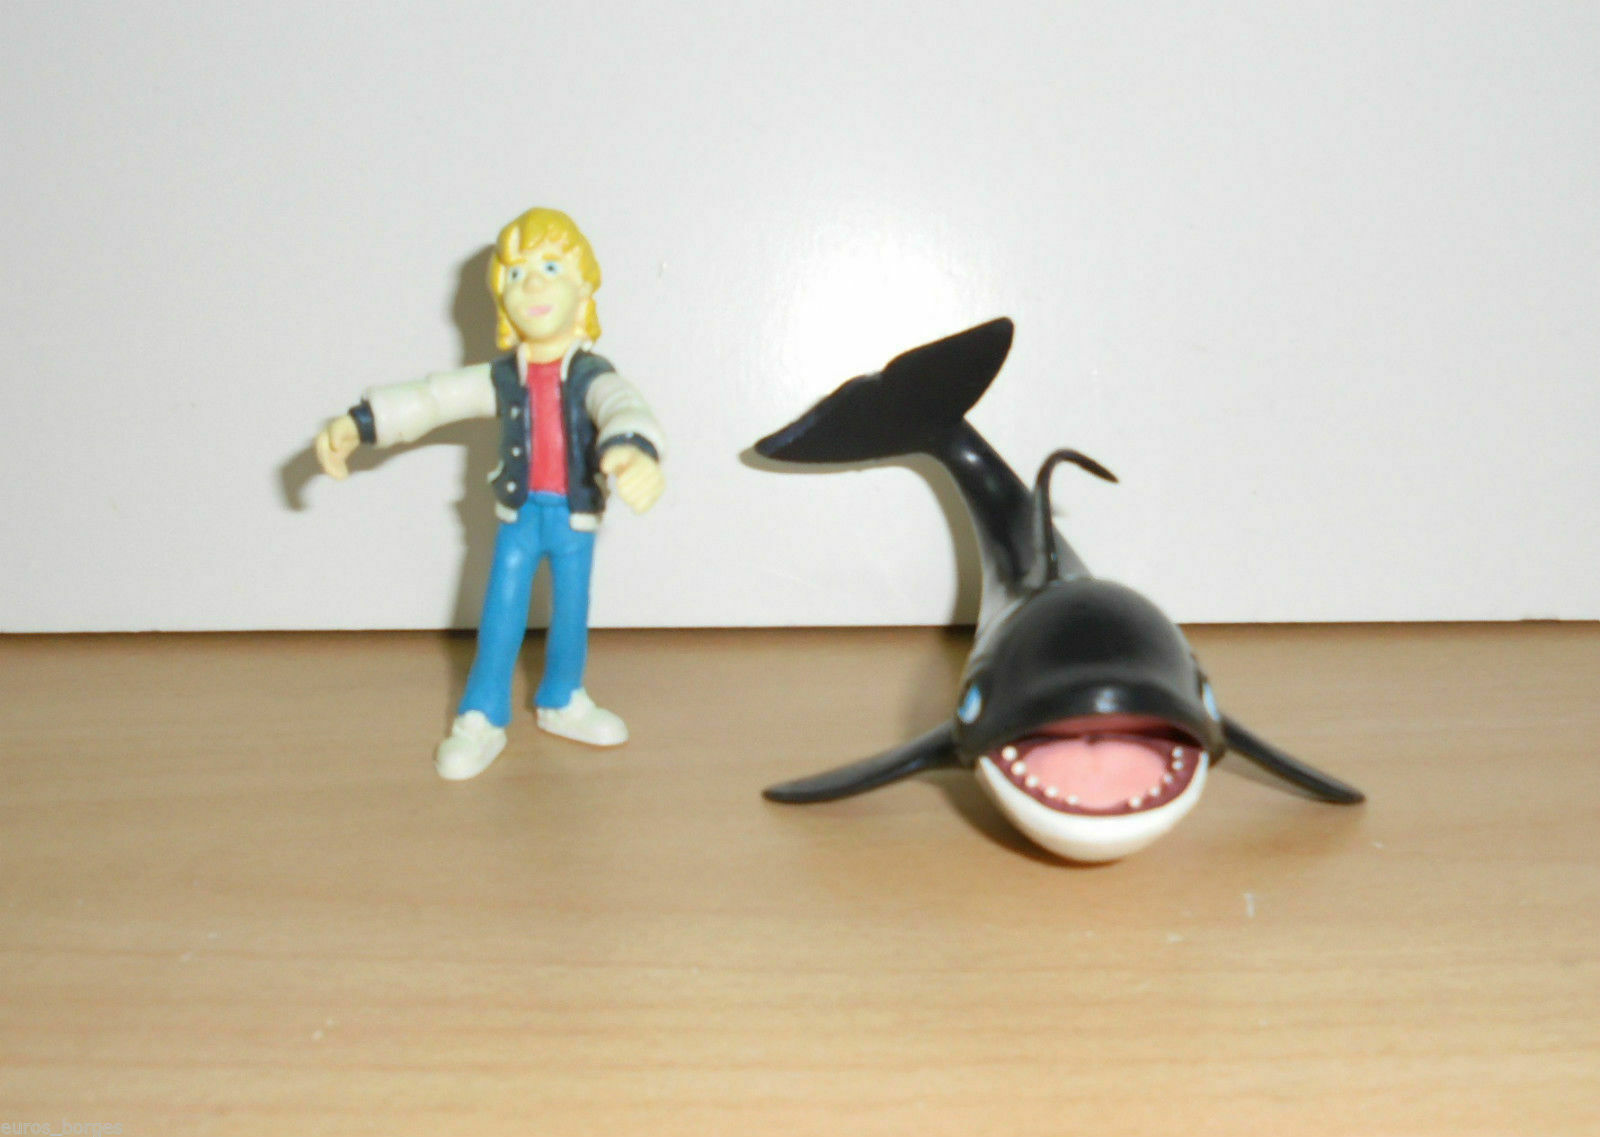 Complete Set    FREE WILLY 2 PVC Figures figurine WARNER BROS 1995 767df5